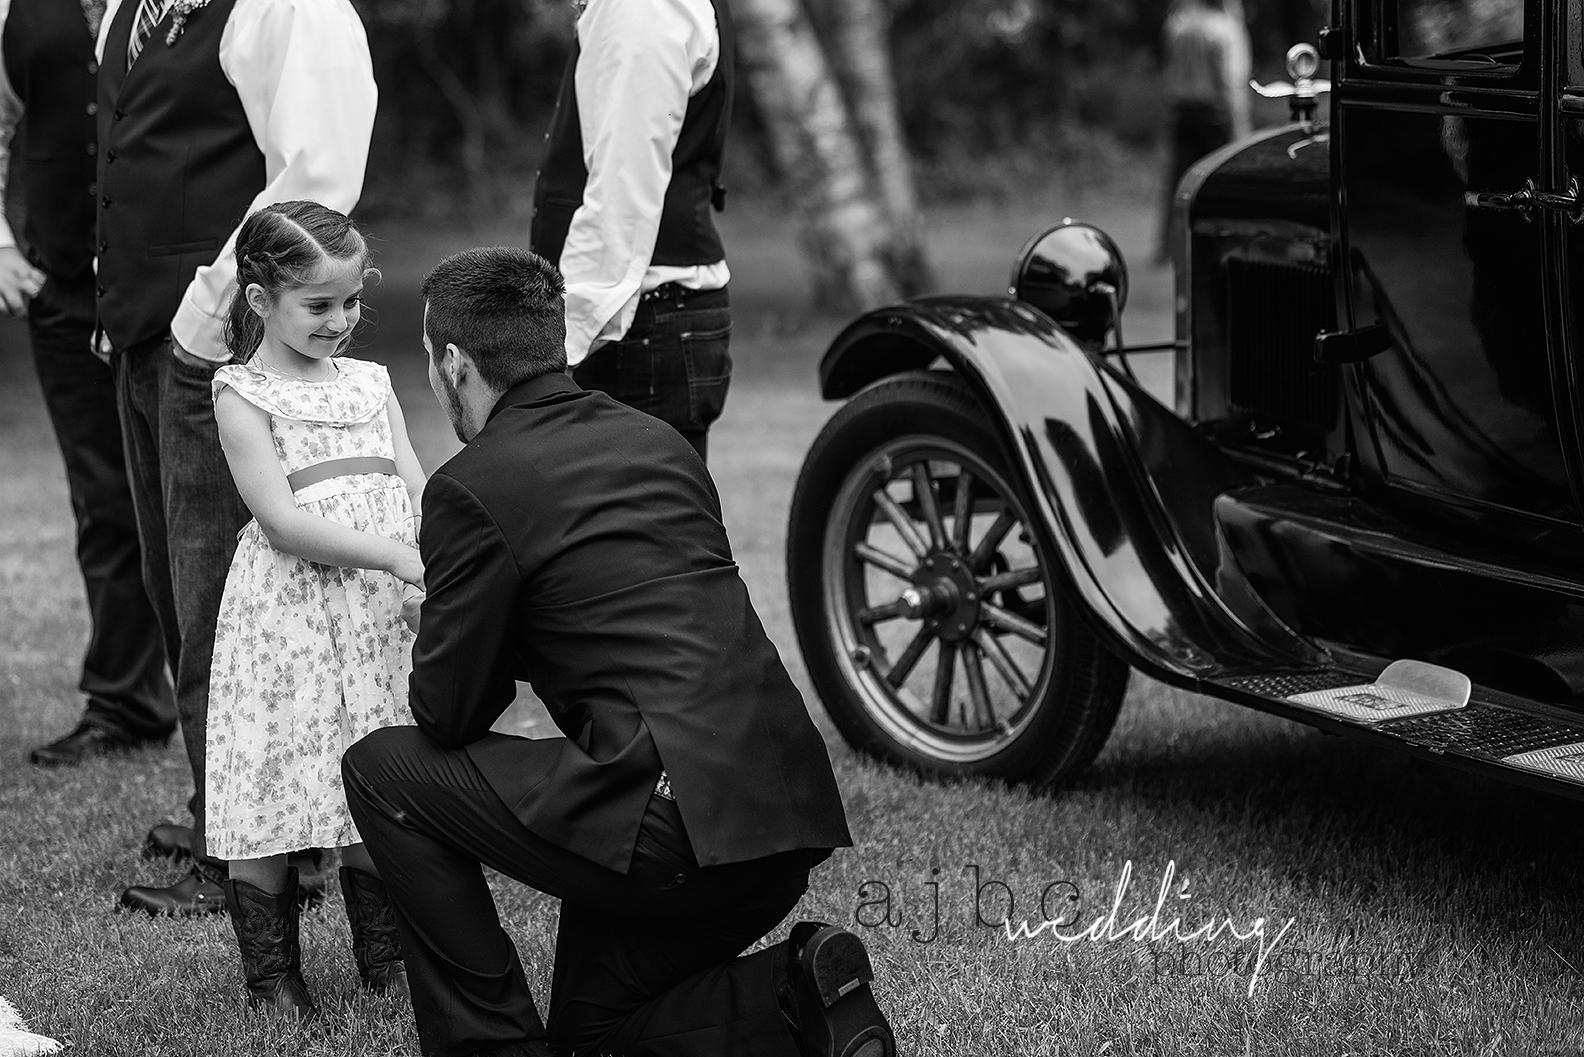 ajbcphotography-port-huron-michigan-wedding-photographer-outdoors-summer-wedding-country-wedding-wadhams-michigan-bride-vintage-wedding.jpg